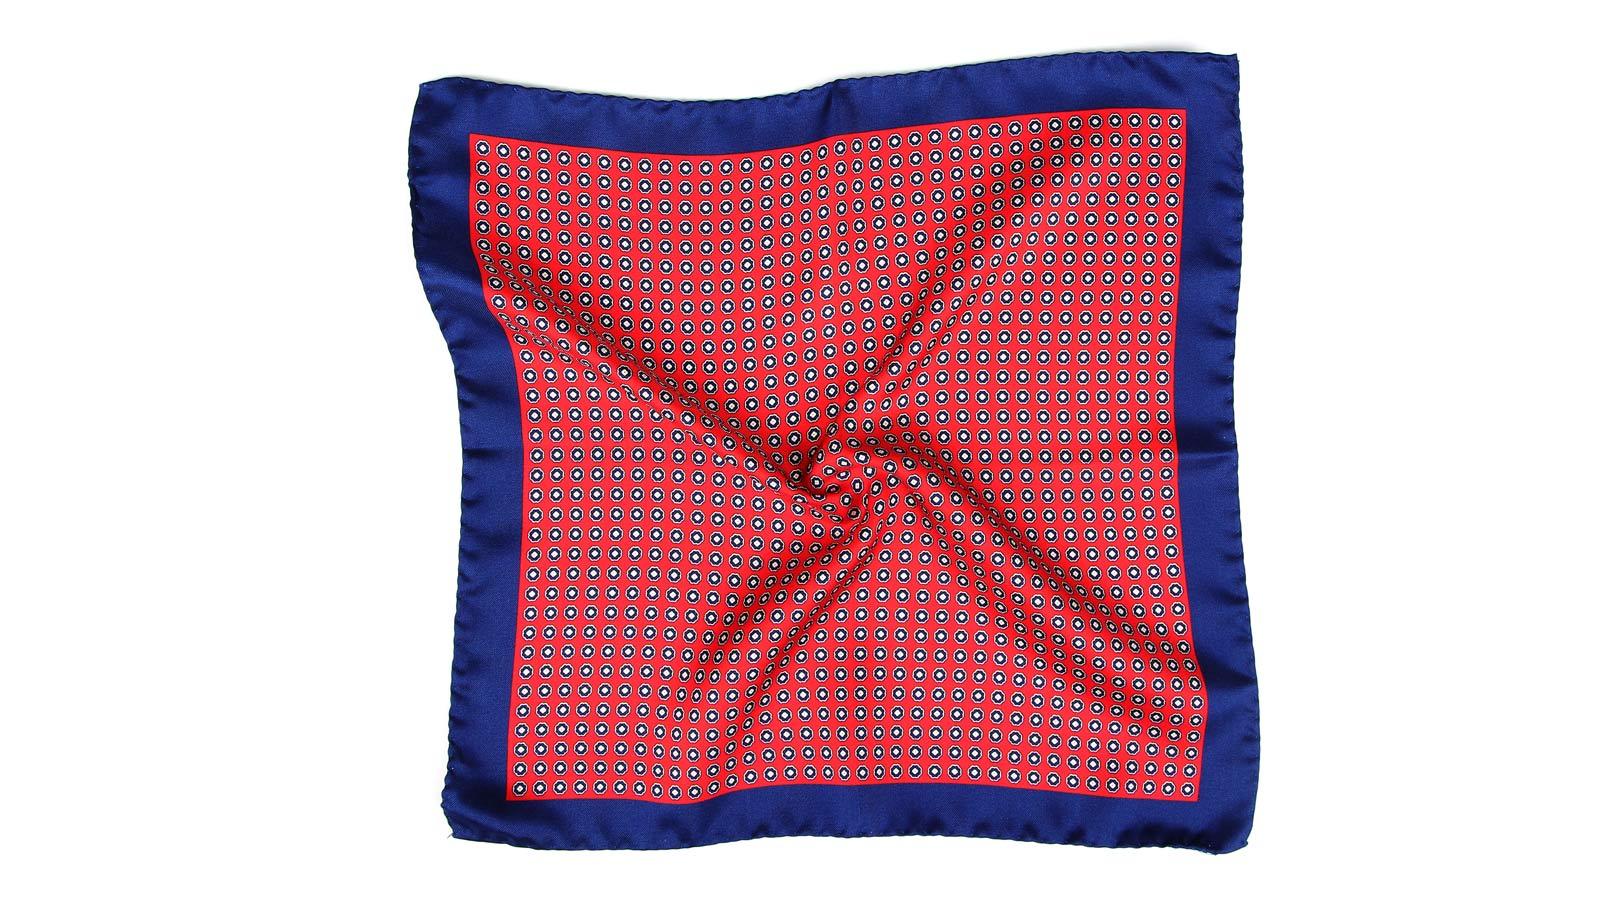 Red & Navy Silk Pocket Square - slider image